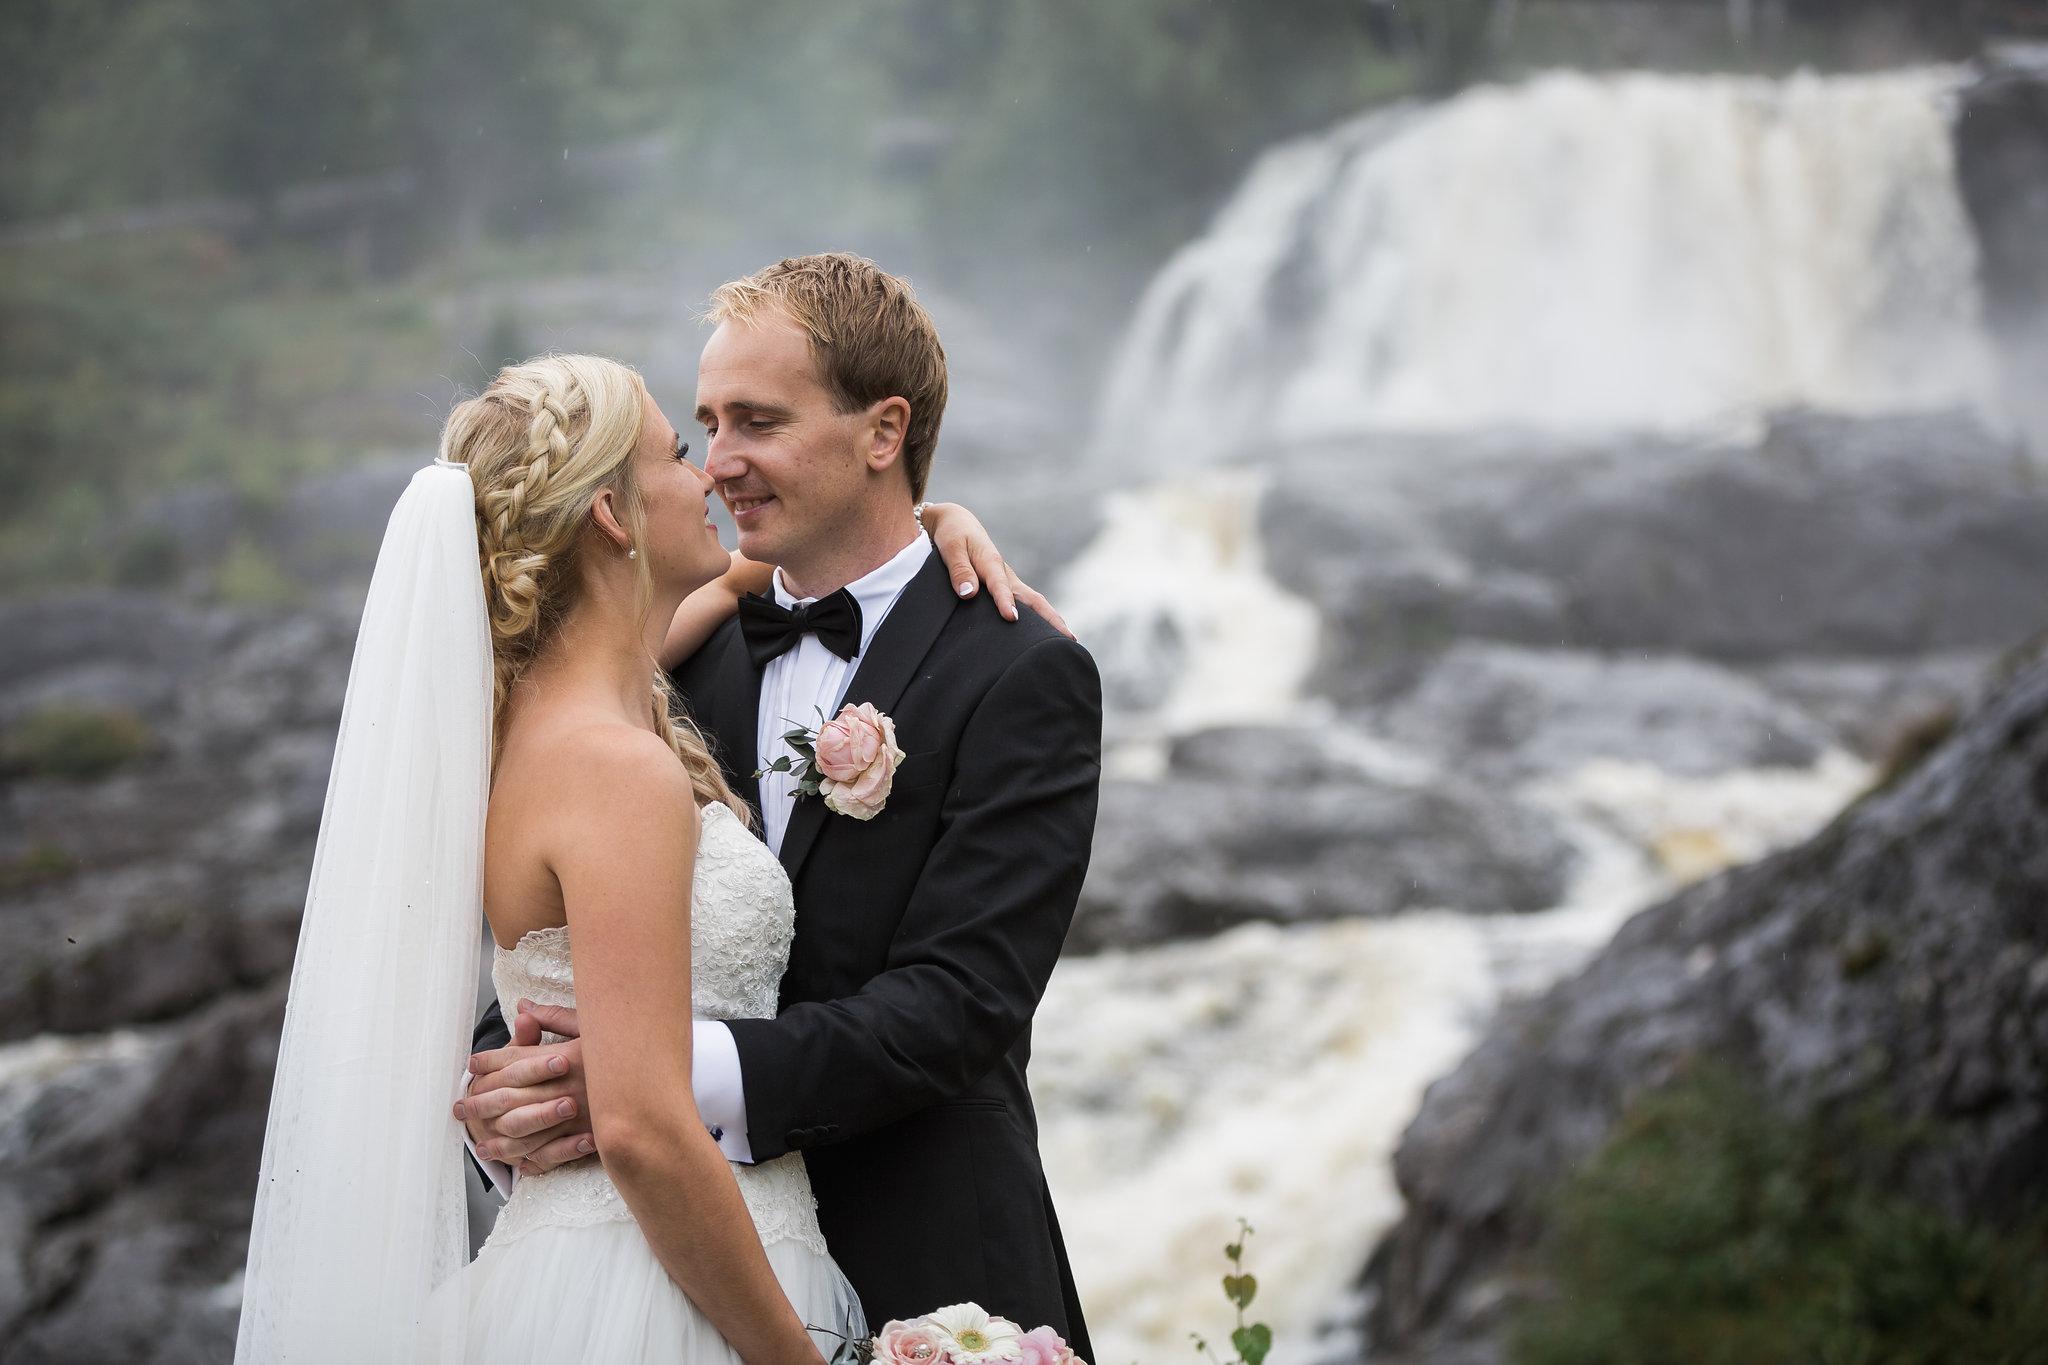 AL_1308_1185fotograf-bryllup-tyrifjorden.jpg